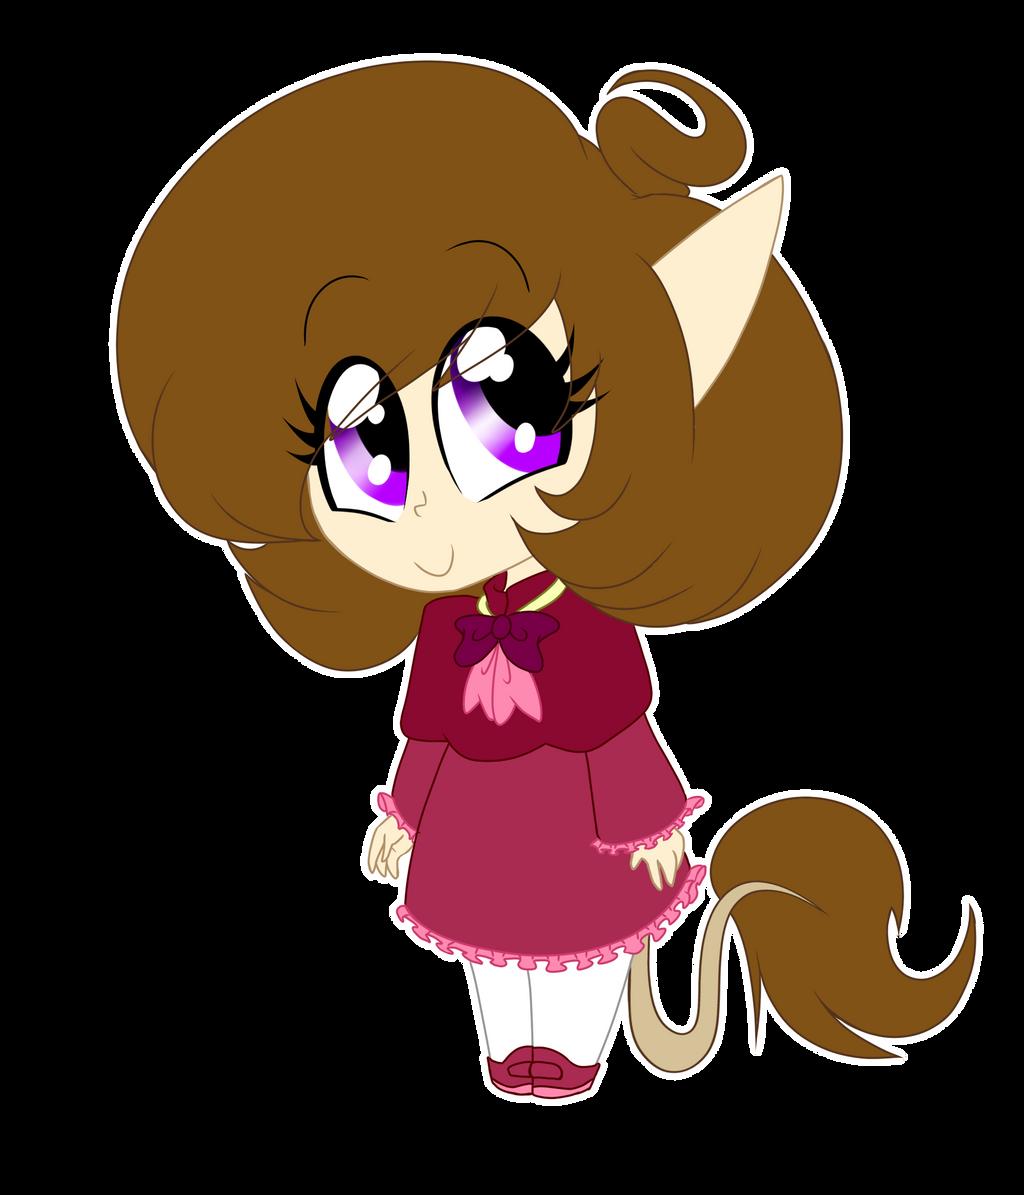 LadyLitaSparkle's Profile Picture